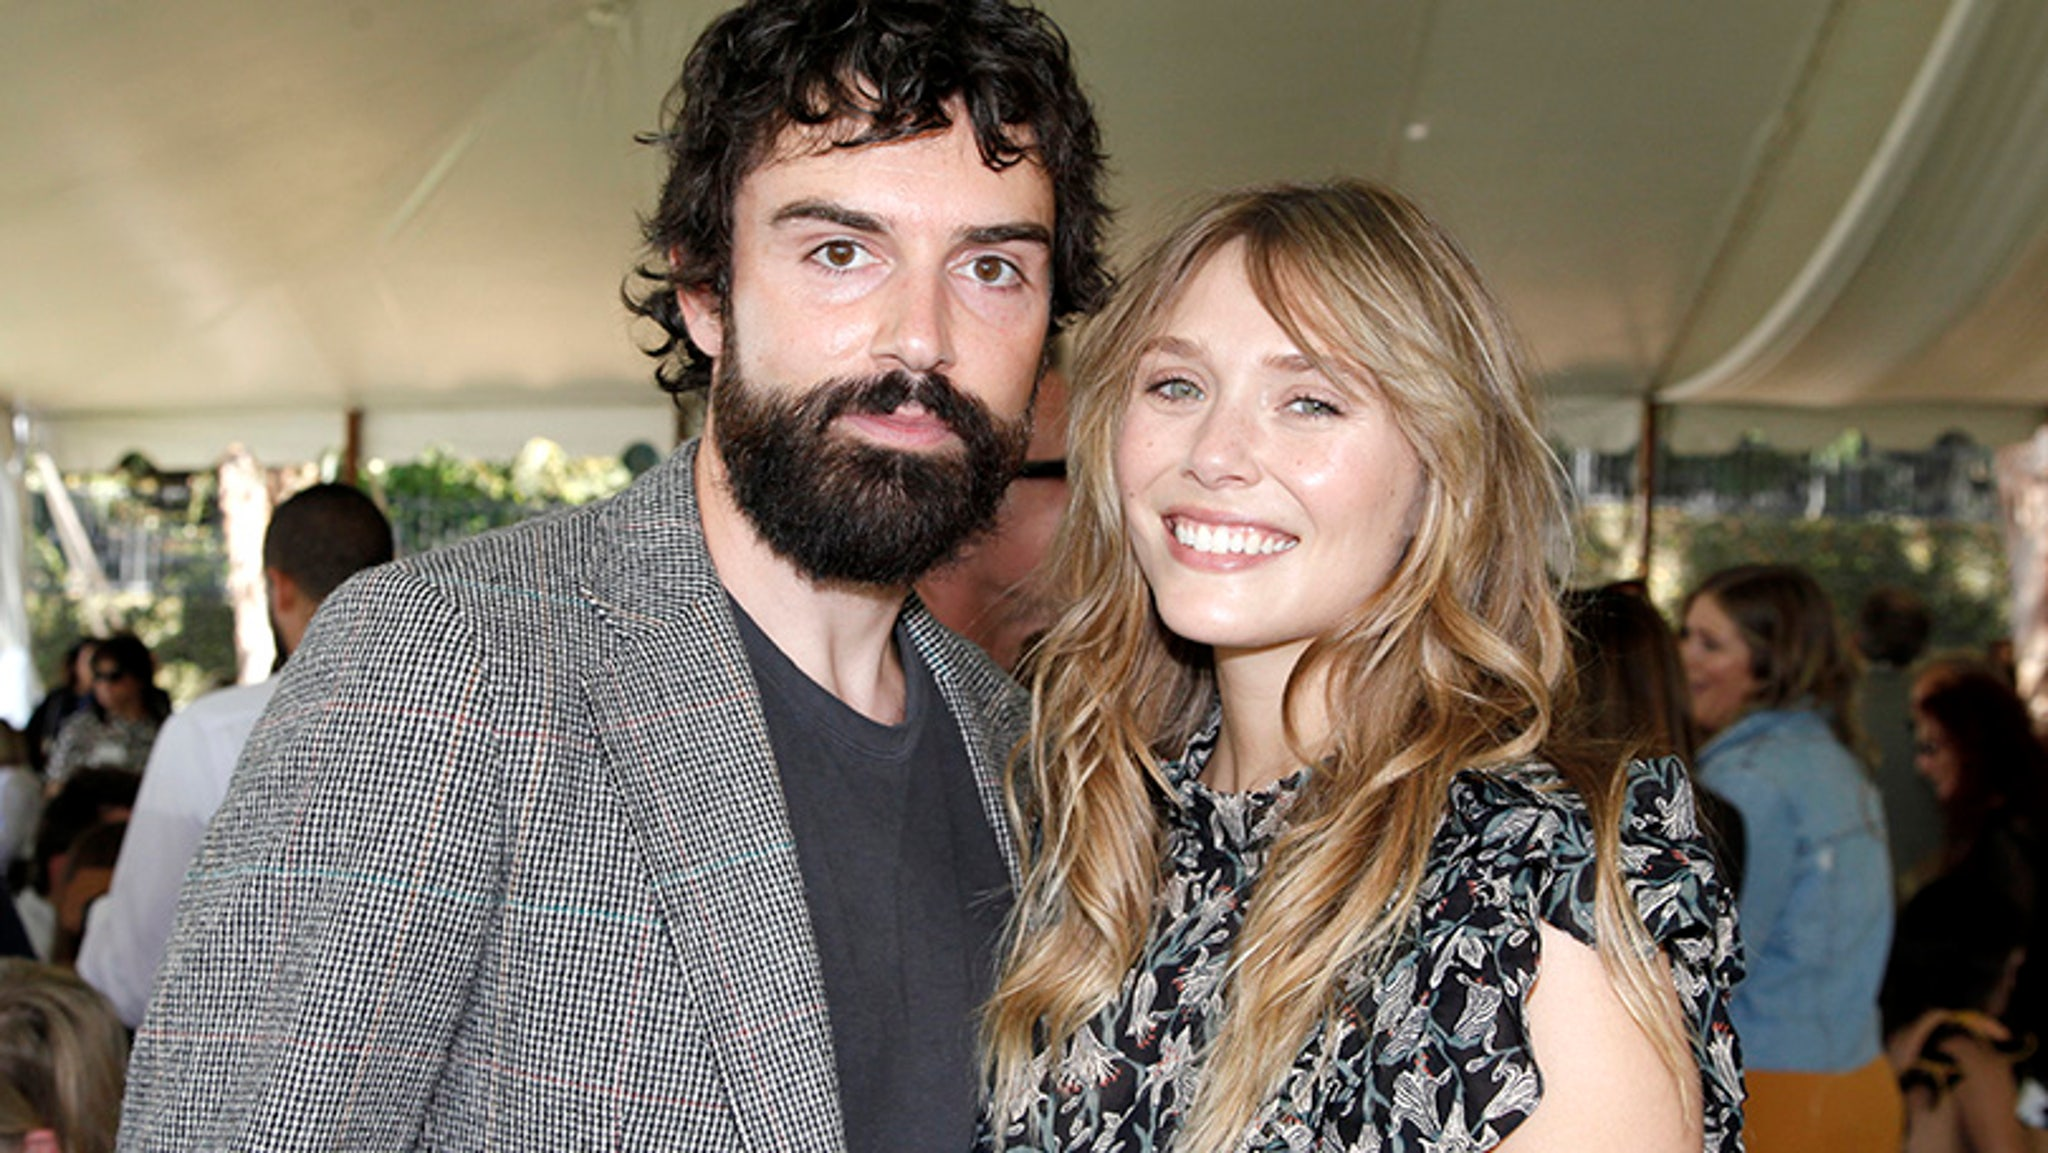 Elizabeth Olsen seems to casually reveal that Robbie Arnett is her 'husband'